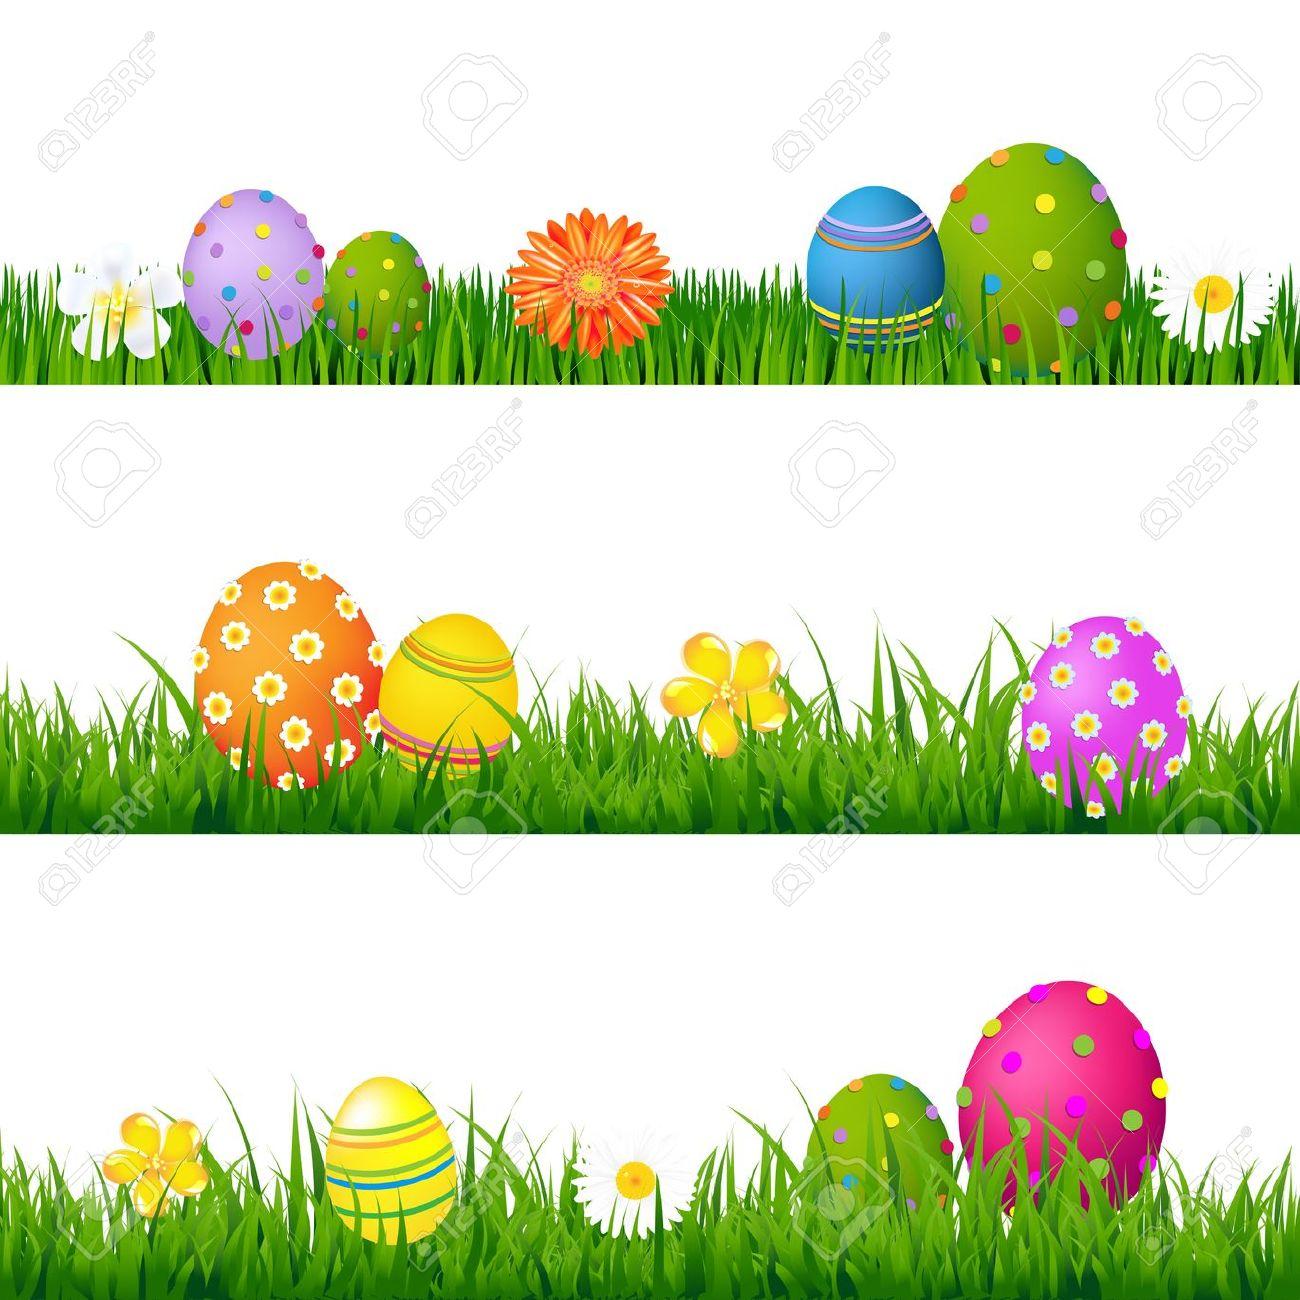 Easter Flower Clipart Background.